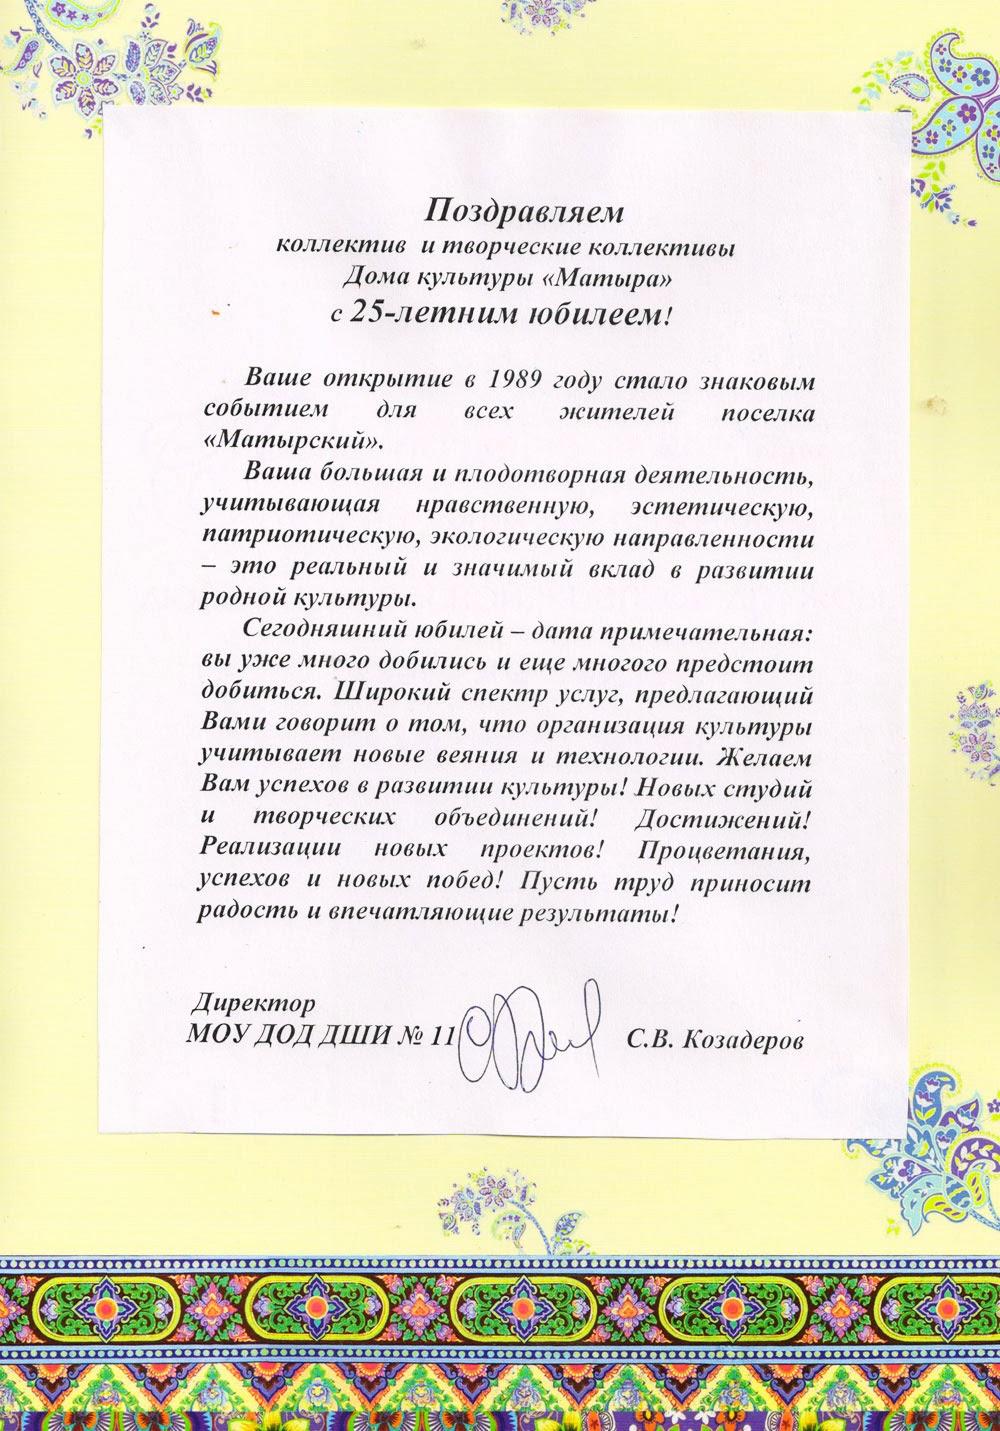 Поздравления коллектива с 15-летием